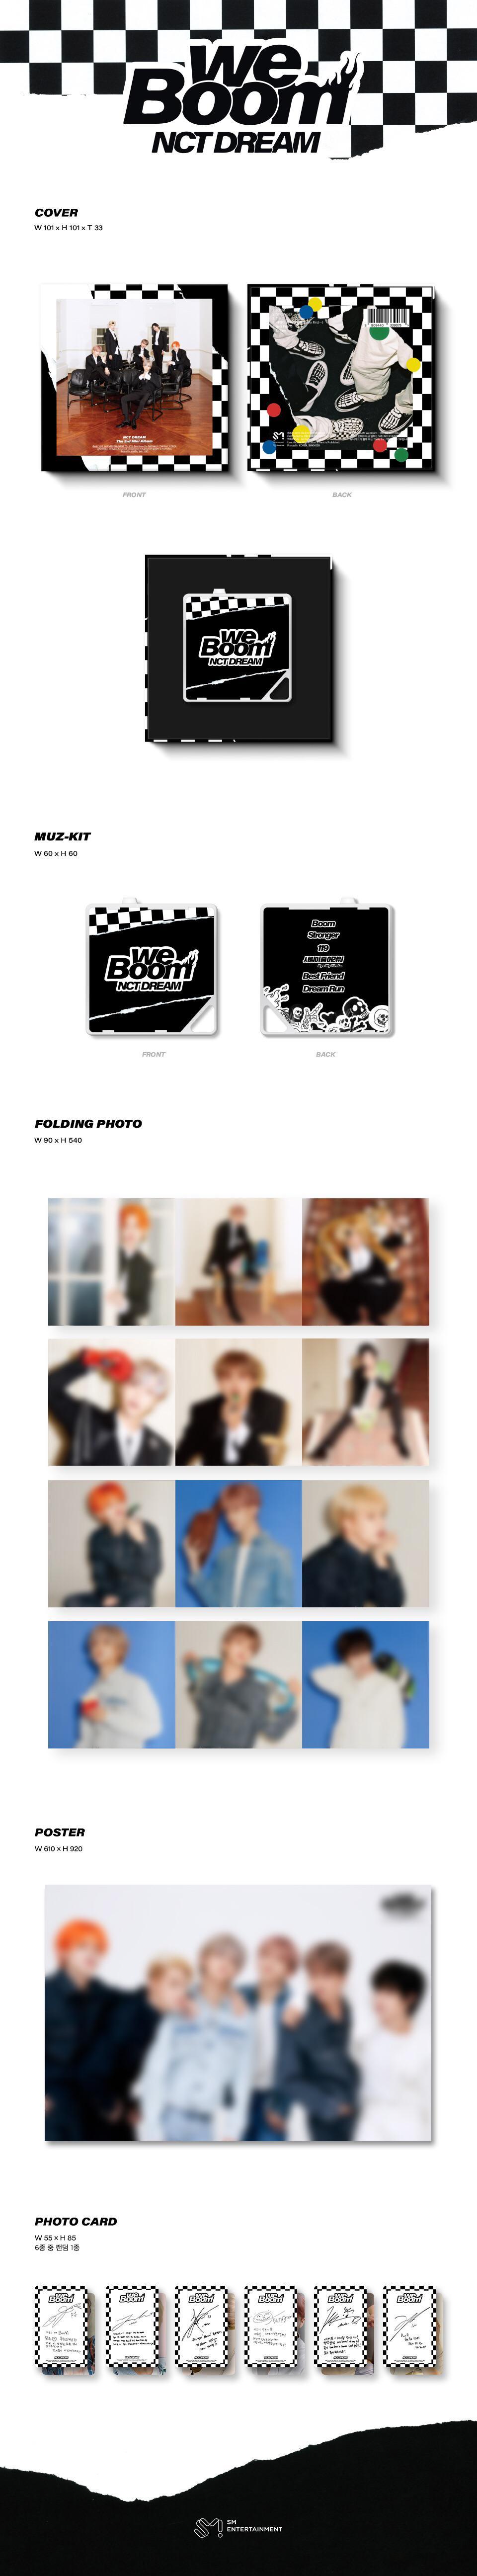 We Boom Kihno Kit Folded Poster KIHNO Album NCT DREAM 3rd Mini Kihno Album